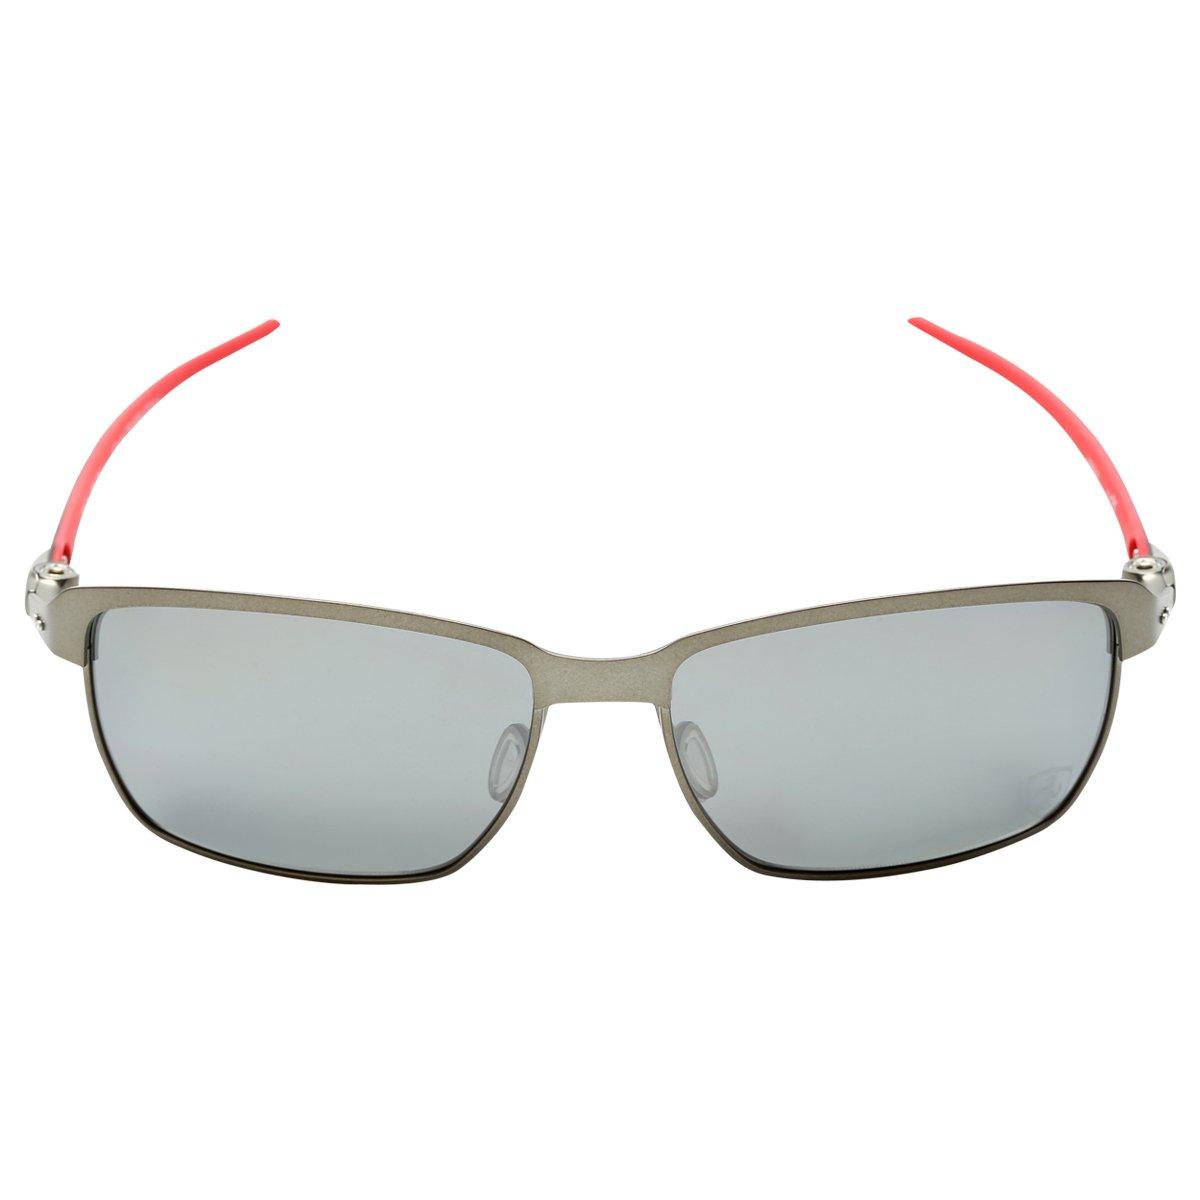 Óculos Oakley Ferrari Tinfoil Carbon - Iridium Polarizado - Compre ... 2fb8f46e8d